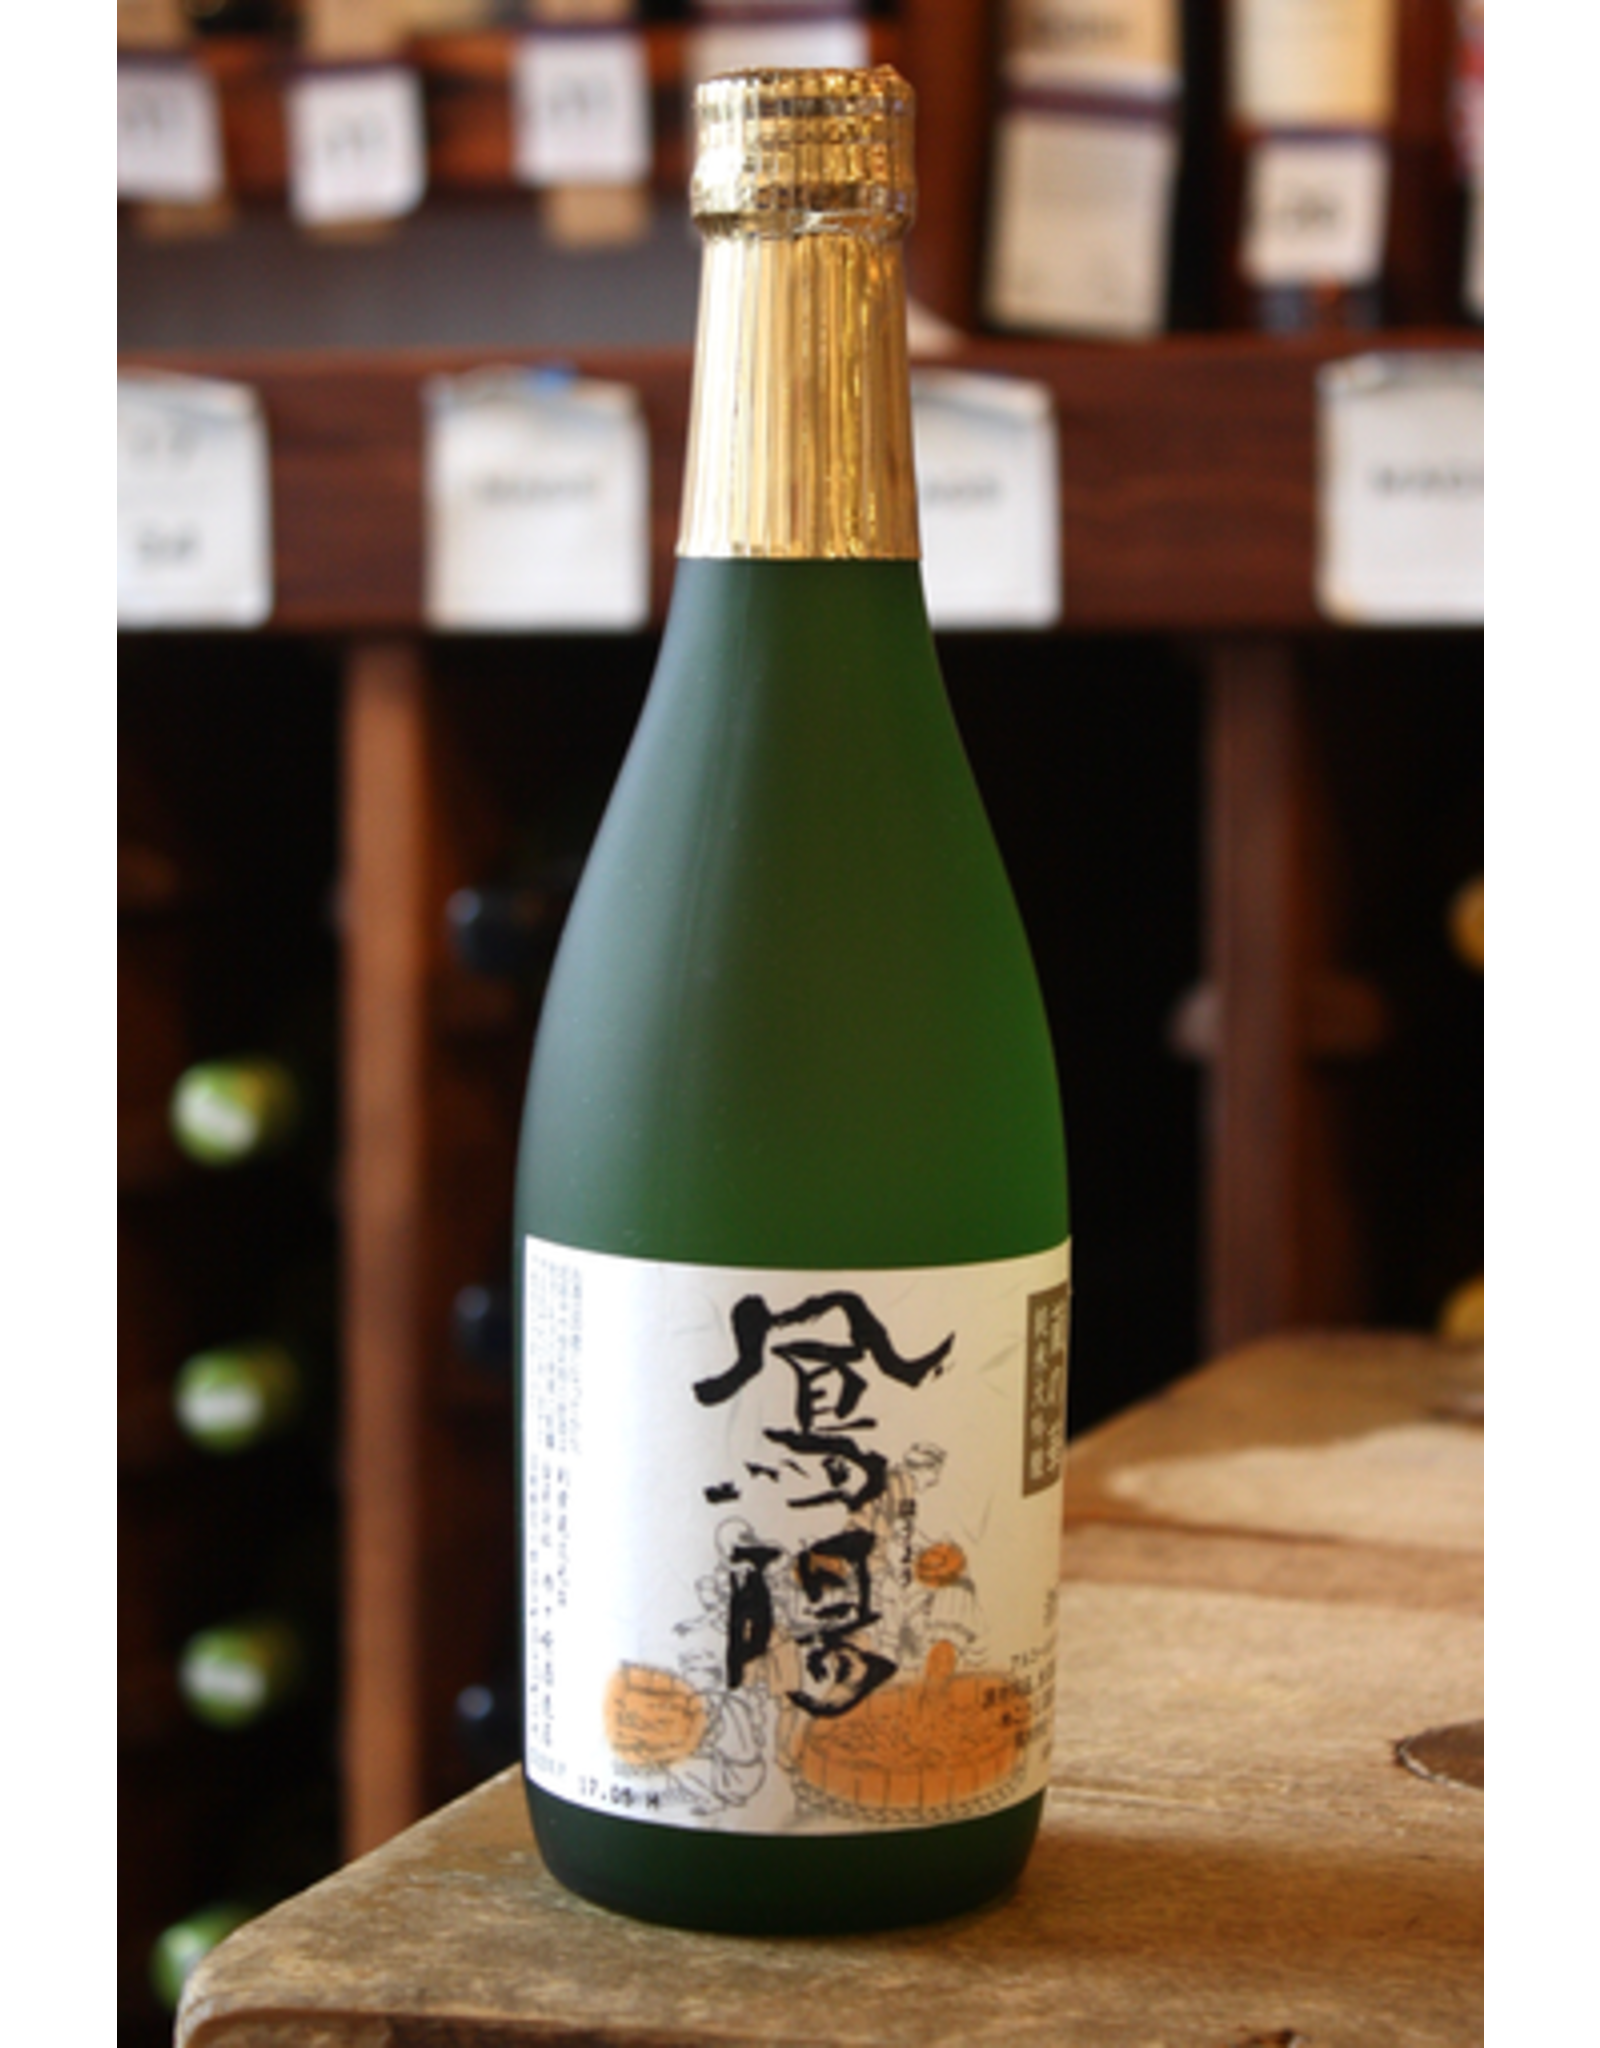 Uchigasaki Hoyo, Kura no Hana 'Fair Maiden' Daiginjo Sake - Miyagi, Japan (500ml)